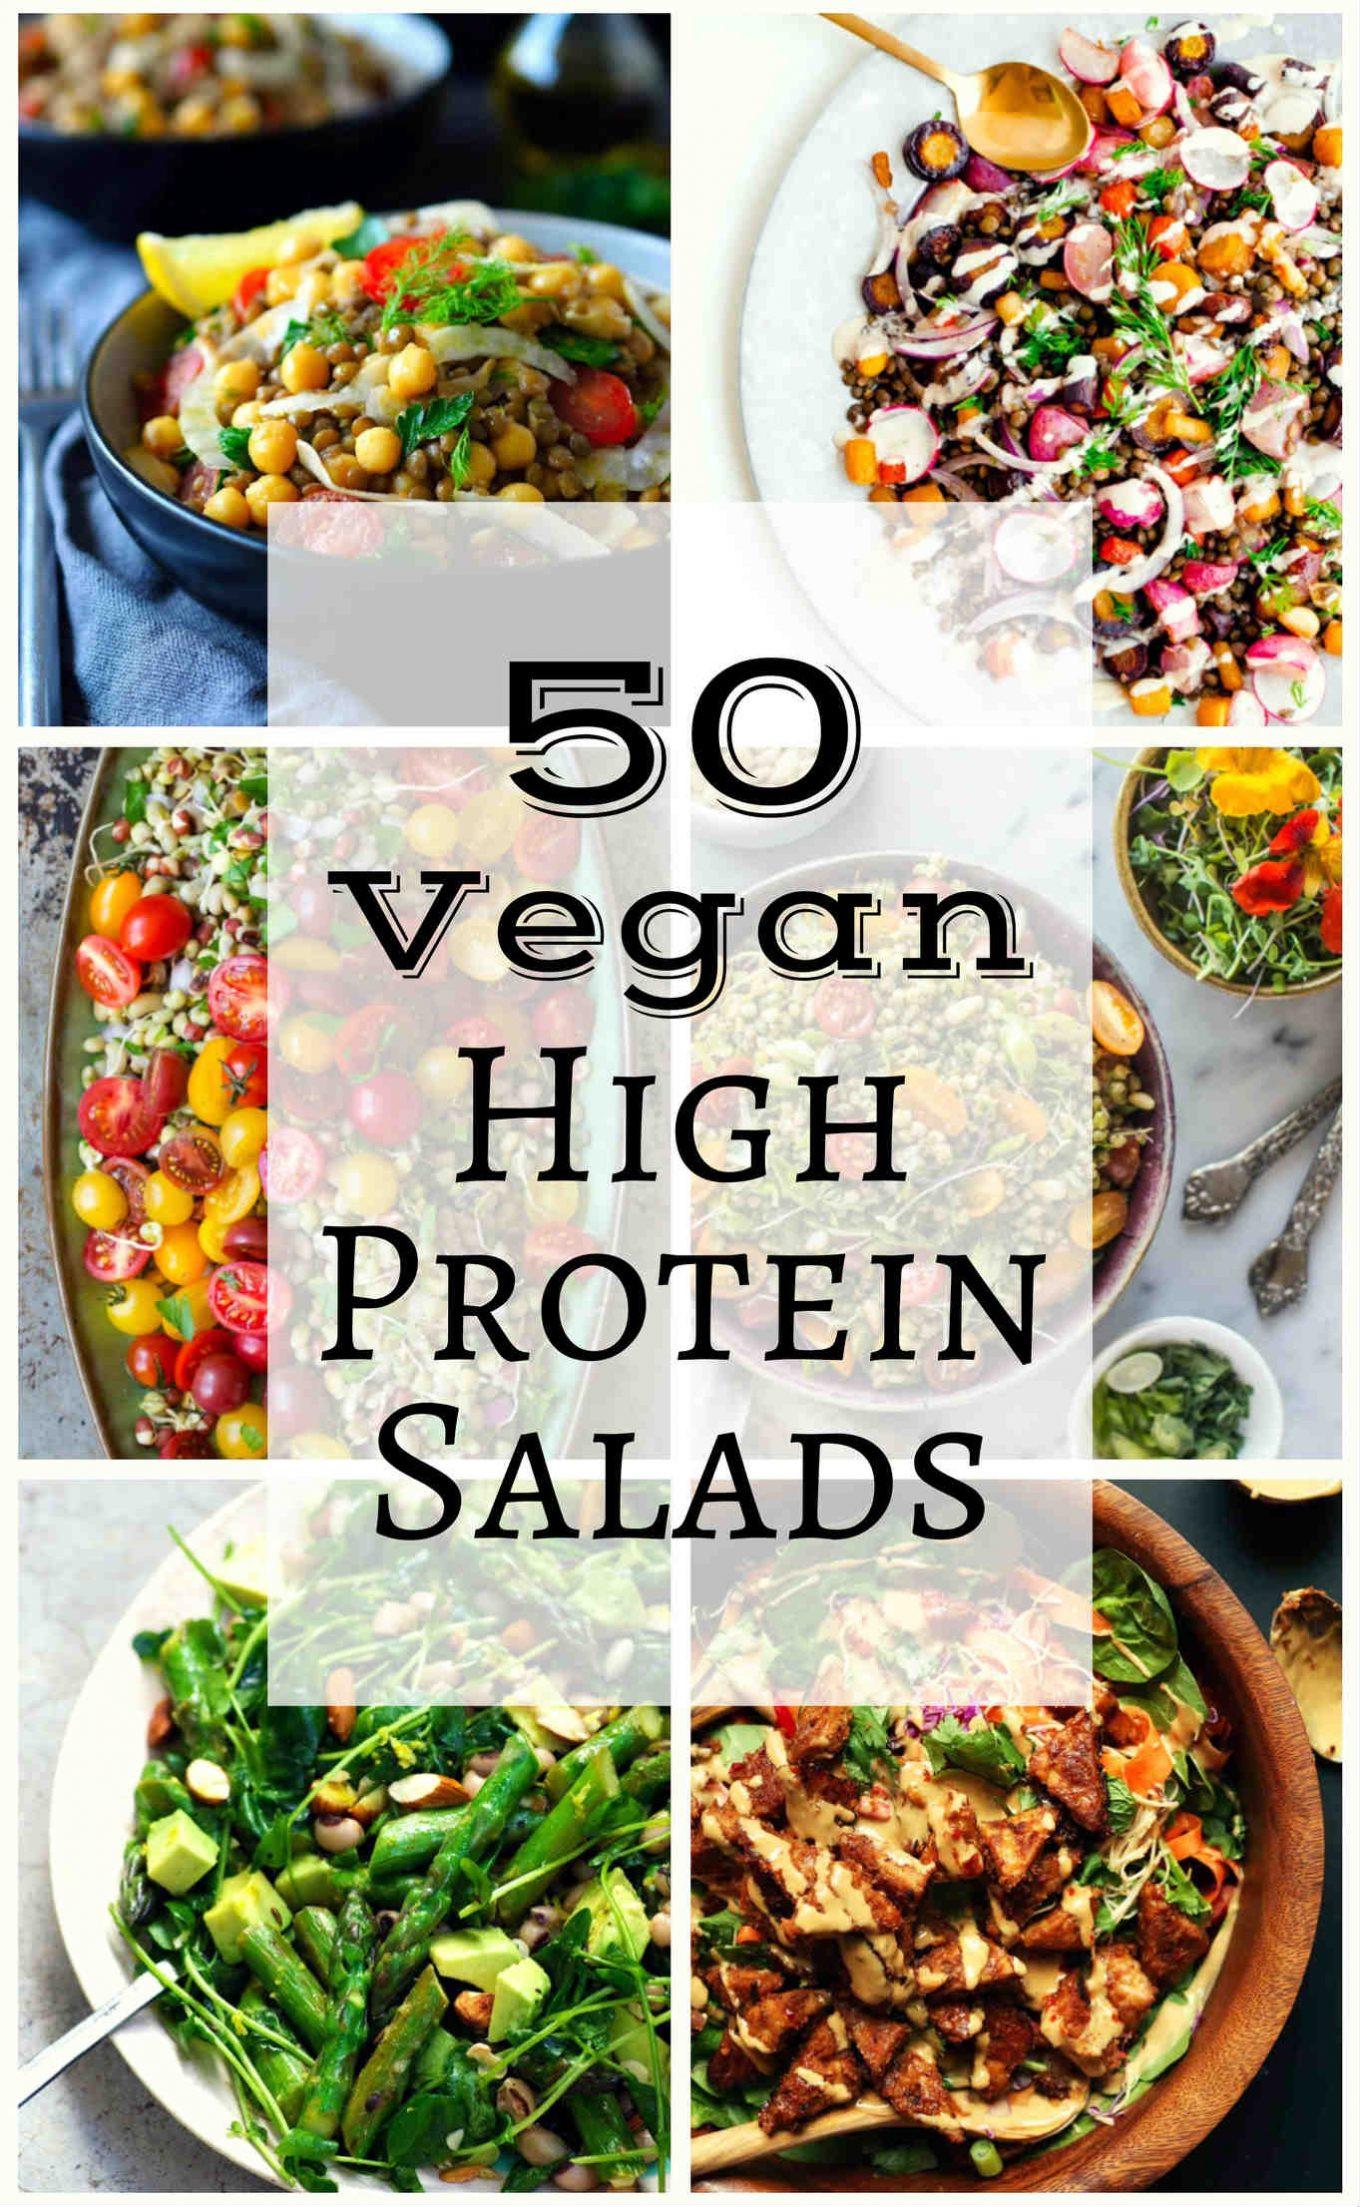 High Protein Vegan Recipes  50 Vegan High Protein Salads